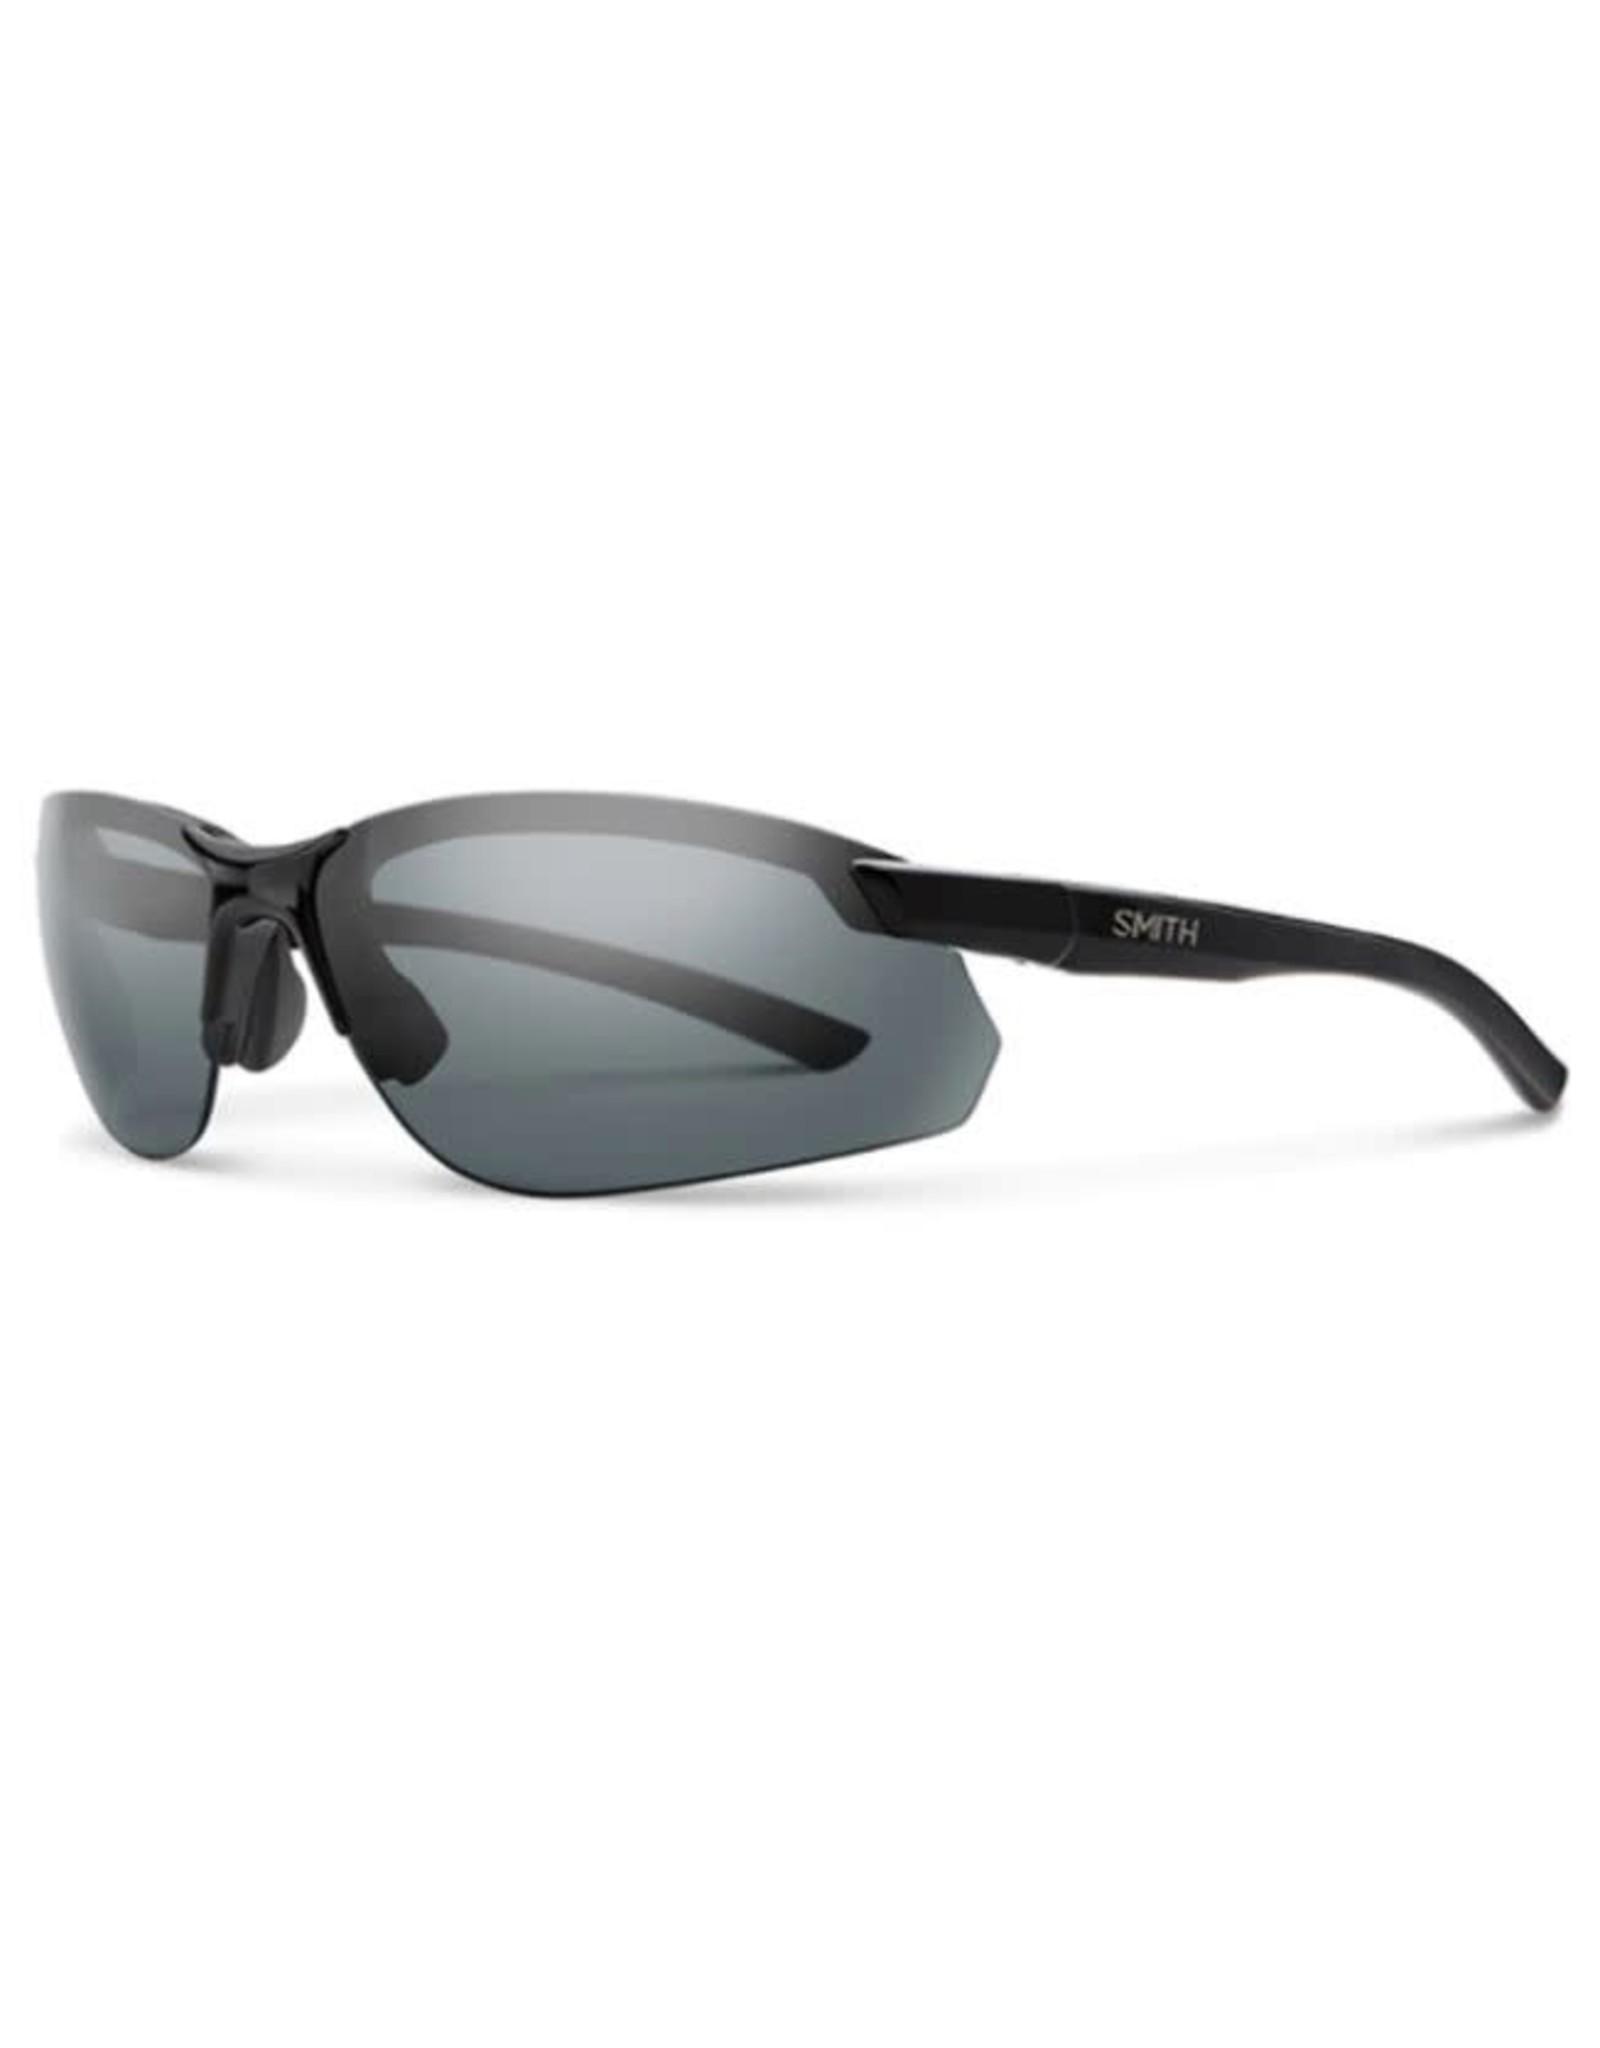 Smith Glasses Smith Parallel carbonic polarized black